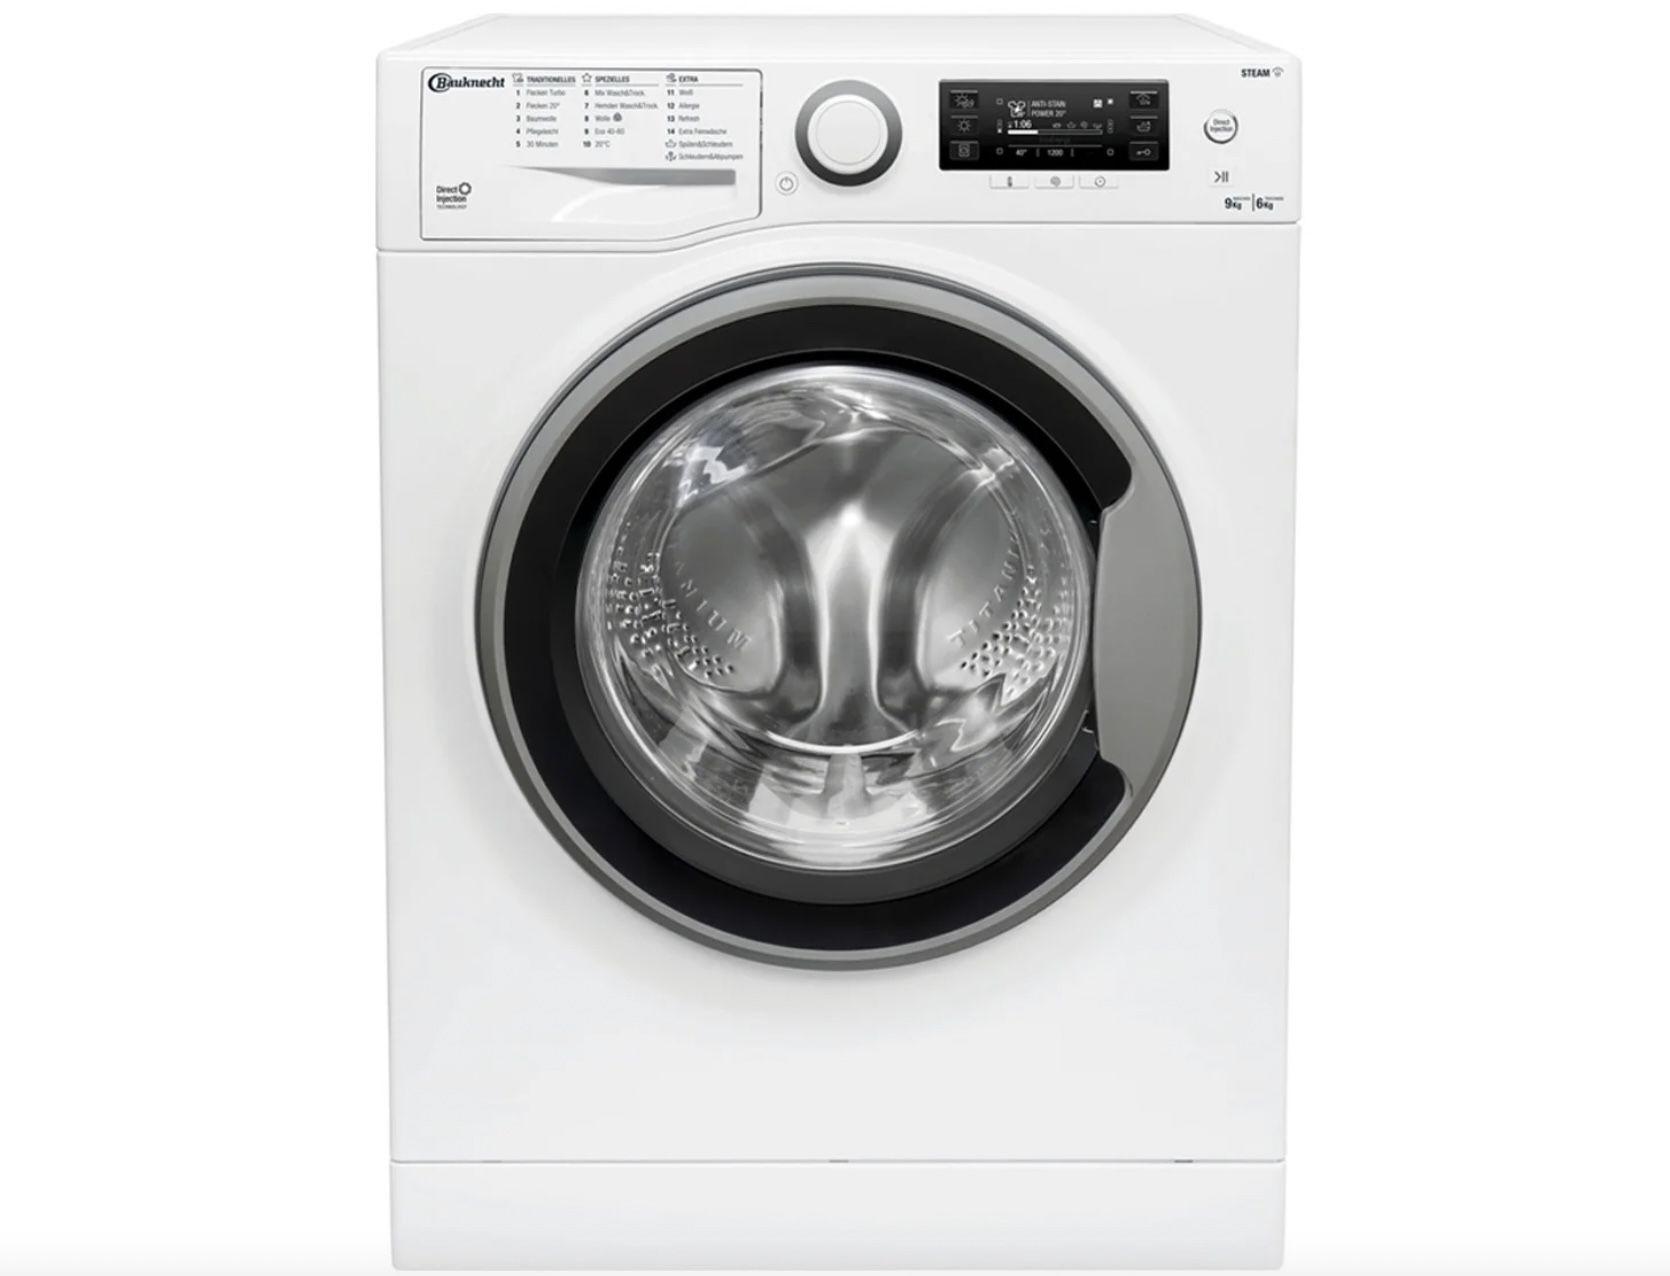 Bauknecht WATK Sense 96L6 DE N Waschtrockner (9 bzw. 6 kg) für 478,95€ (statt 563€)